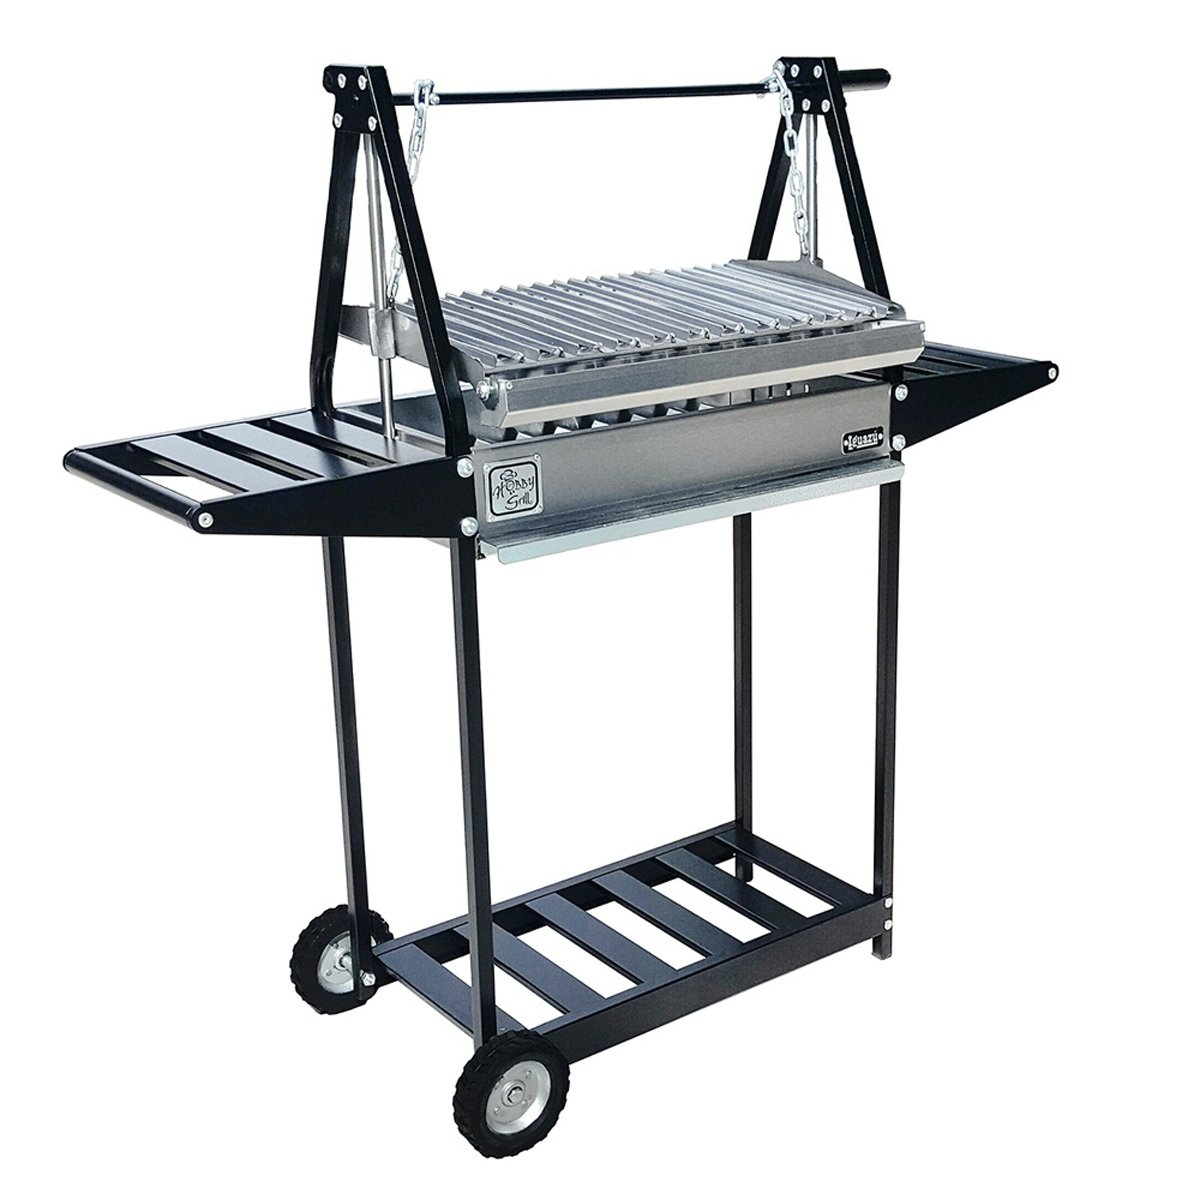 Asador de carbon hobby grill mod iguazu black 2 mesas for Asadores para jardin fotos